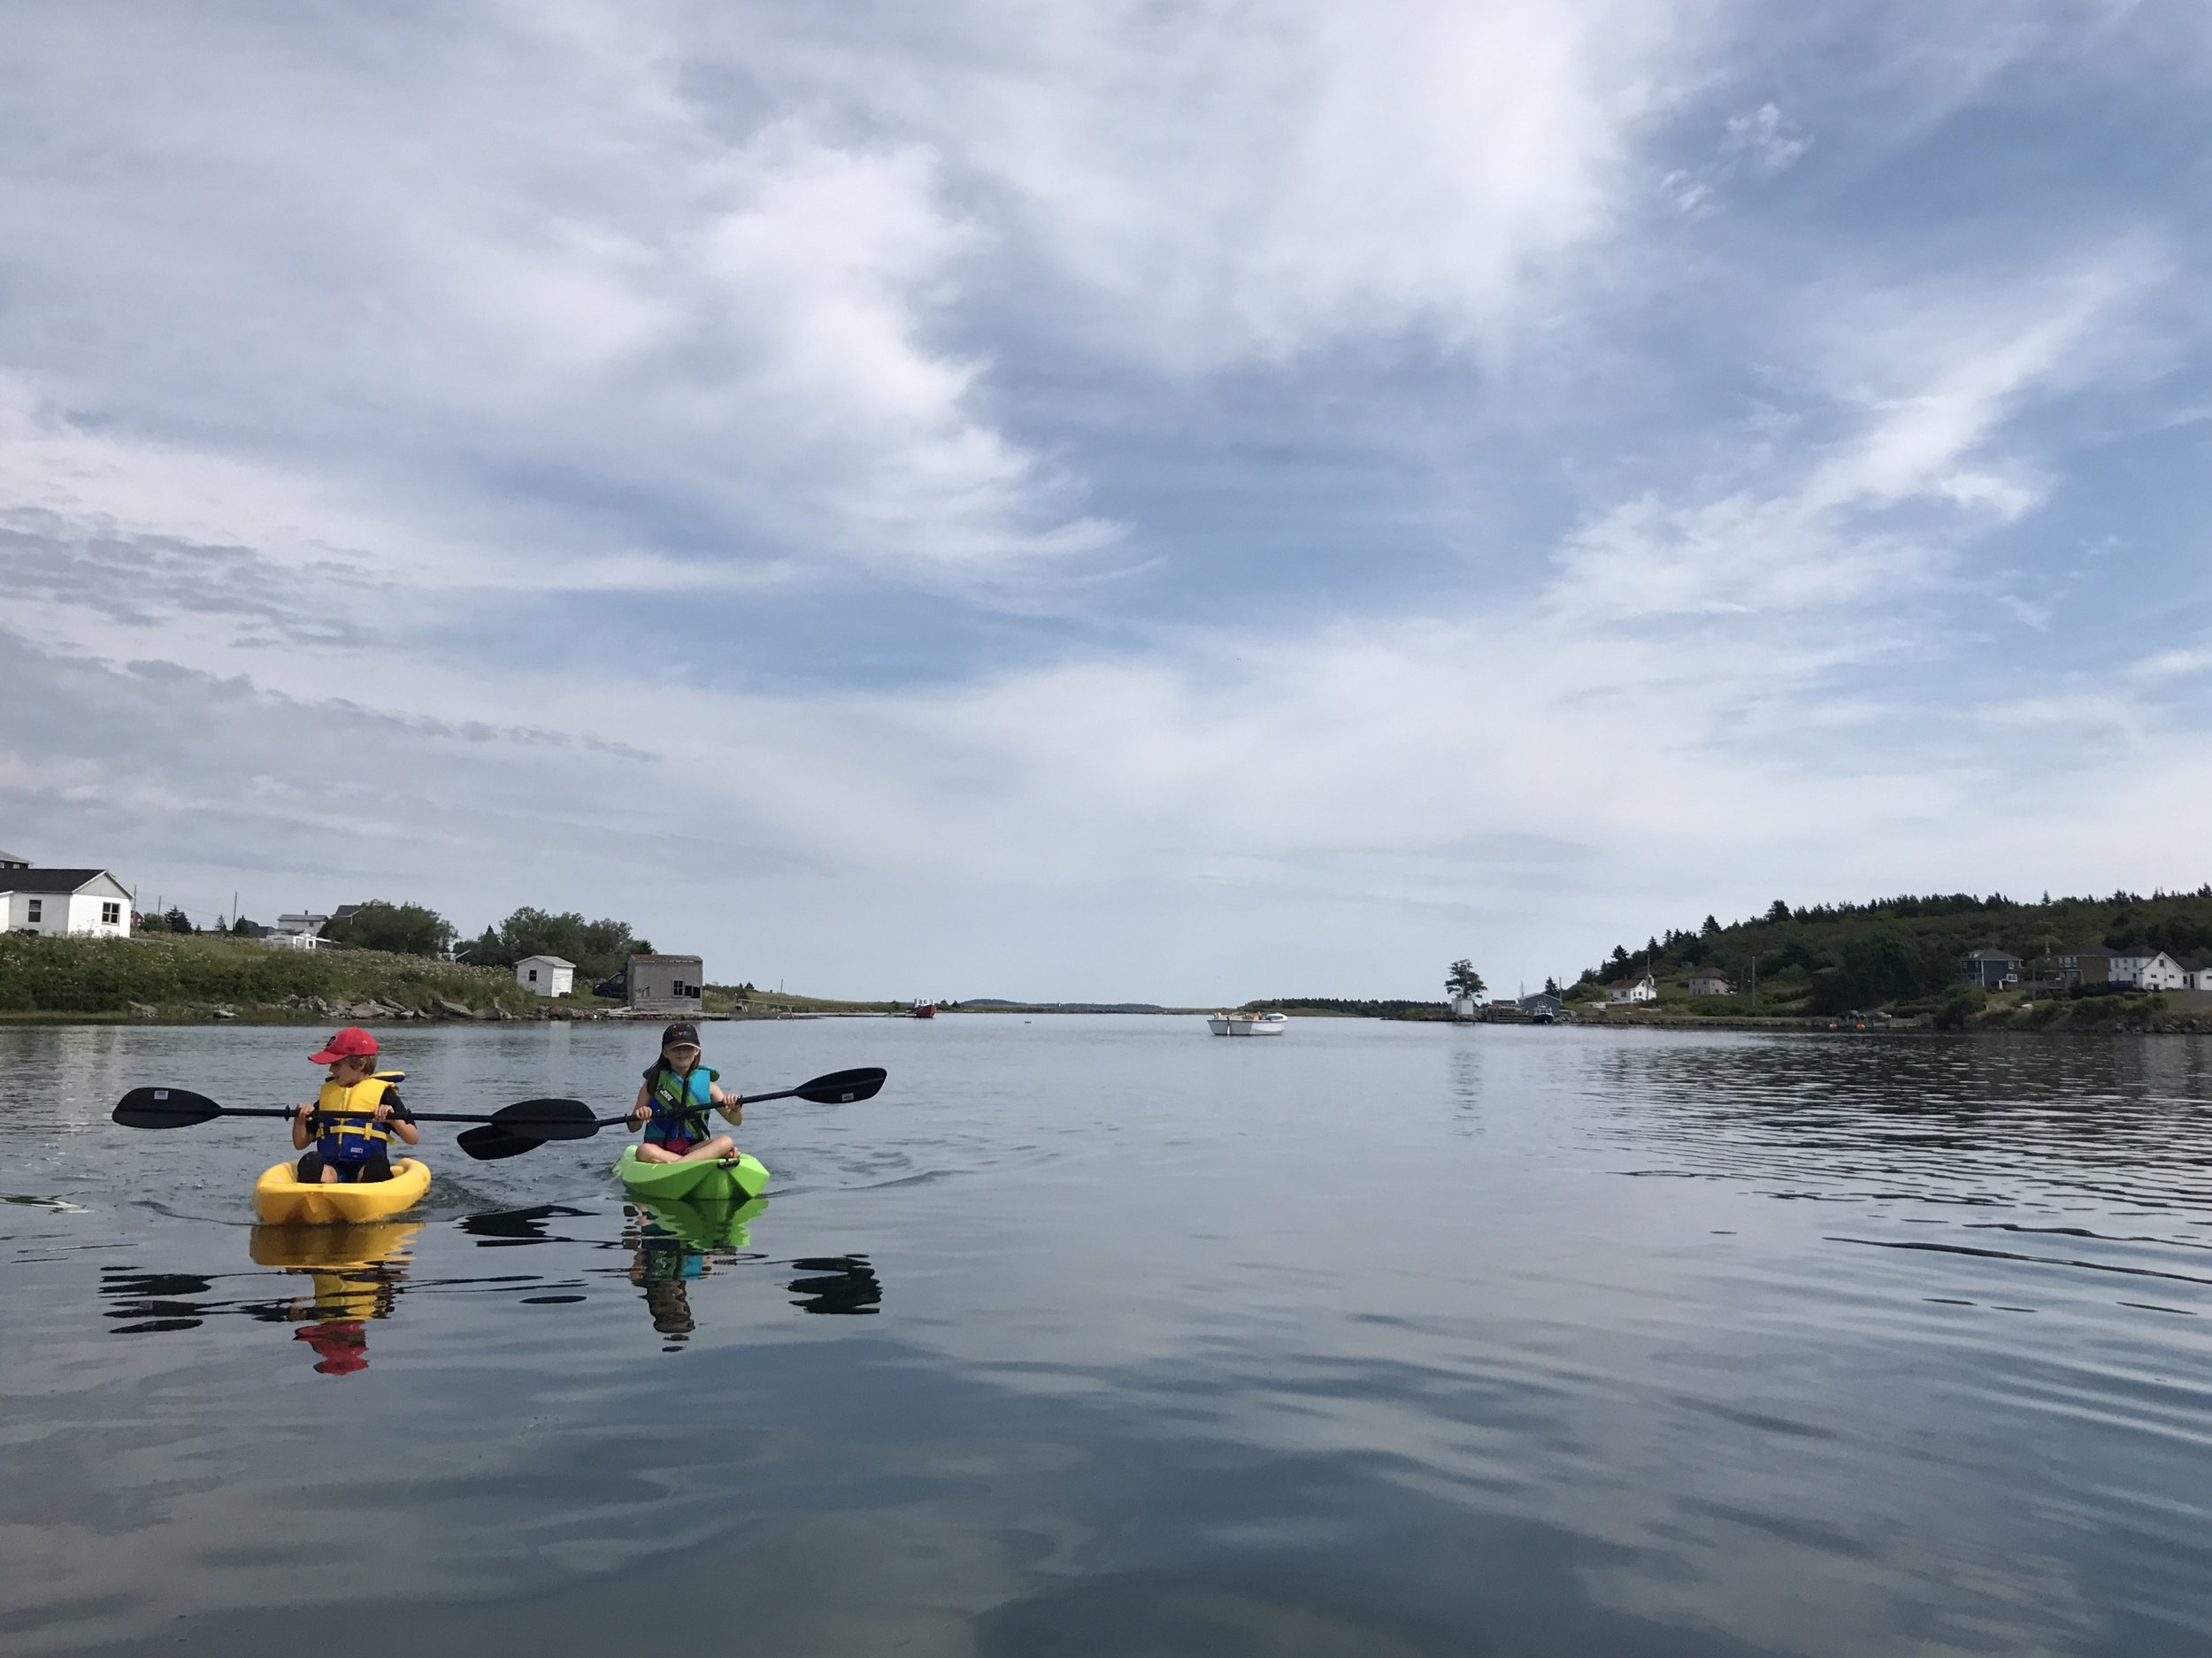 Paddling in the Petit de Grat harbor, Nova Scotia.